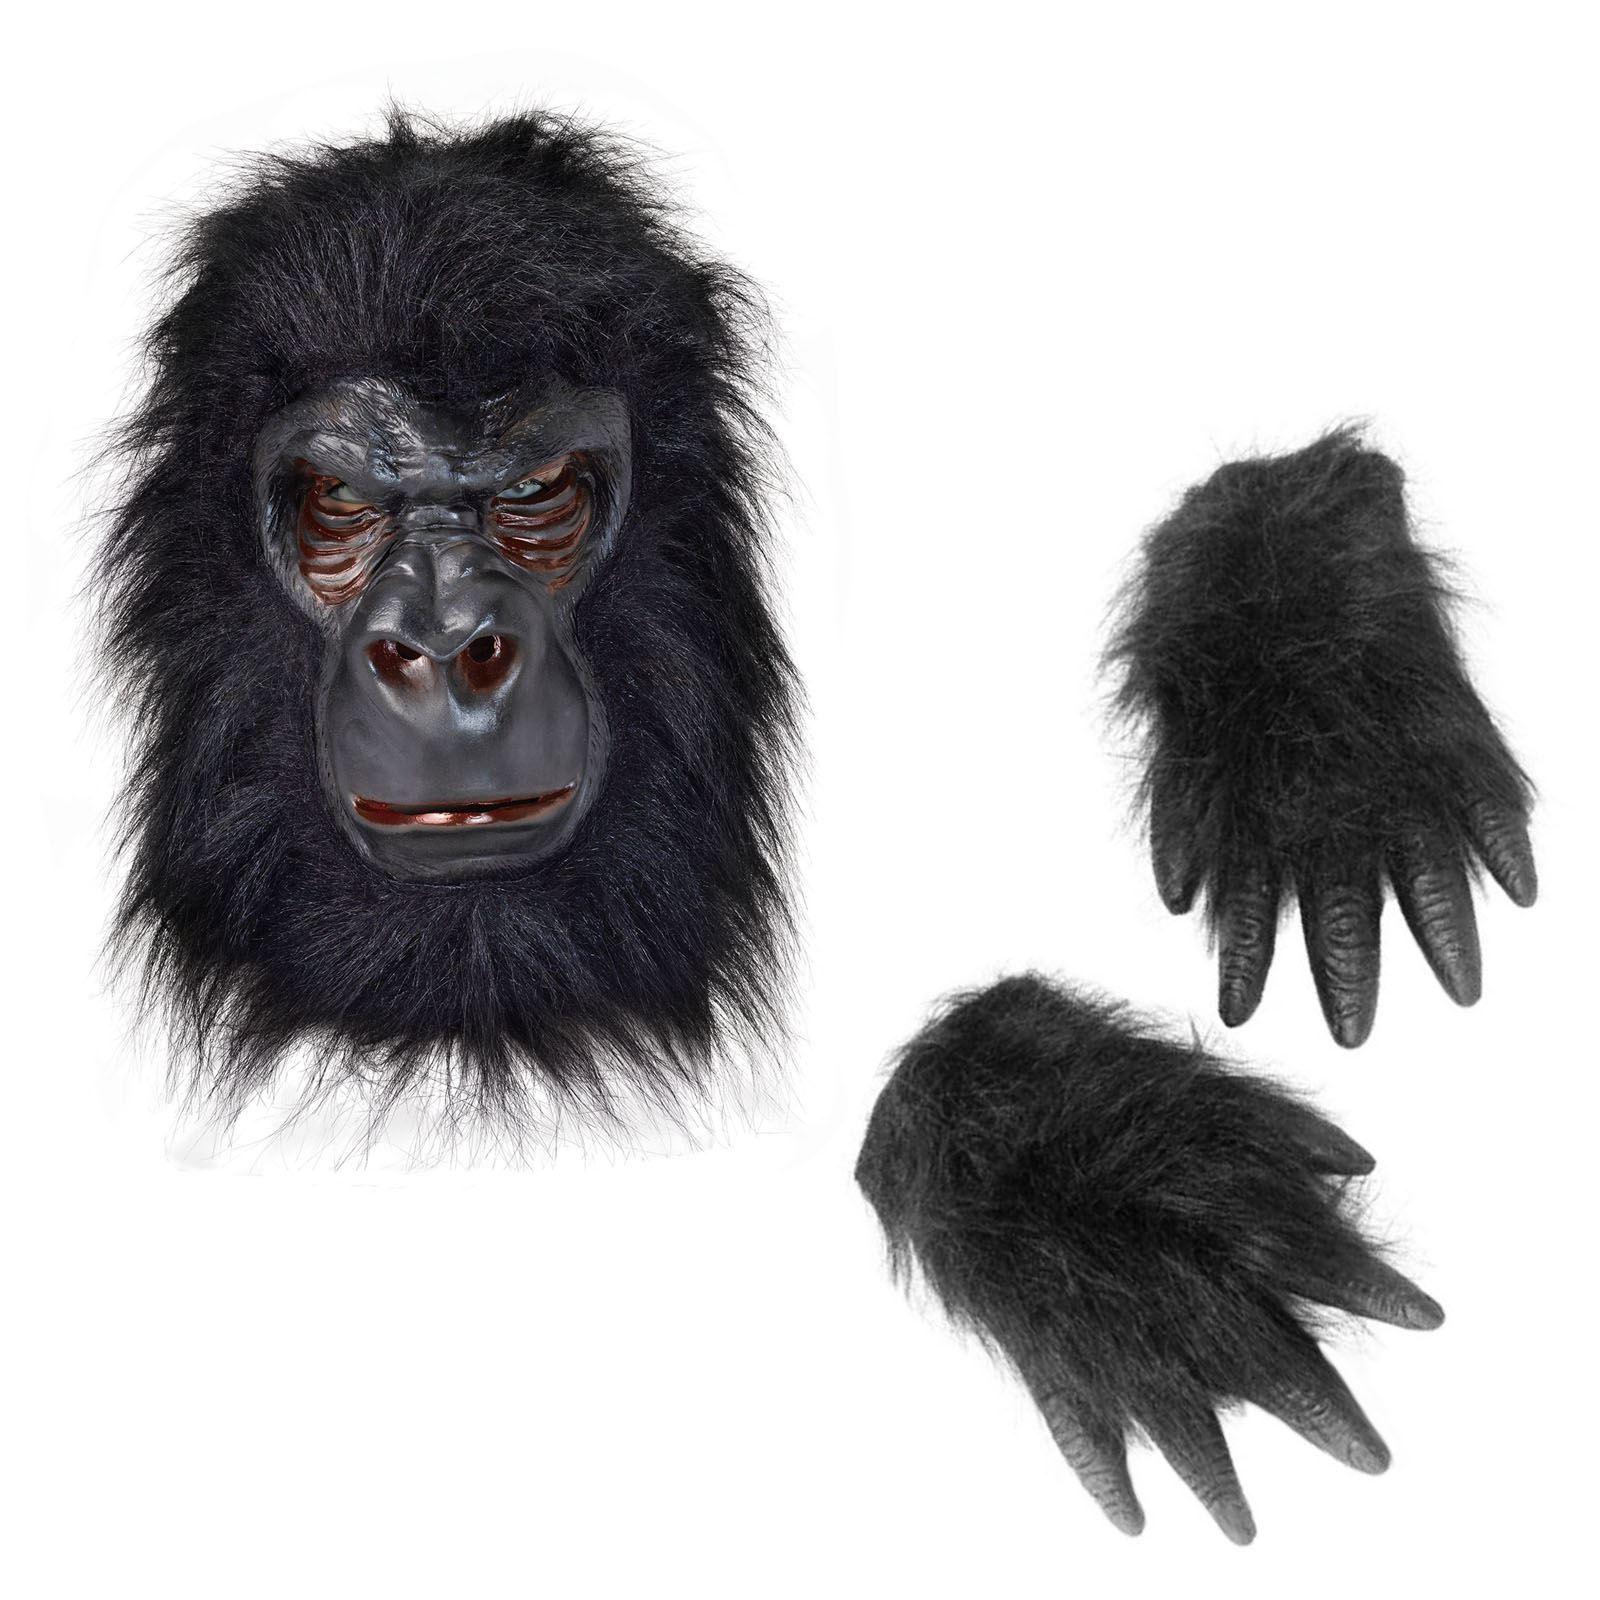 Rubber Gorilla Mask and Gorilla Hand Gloves  sc 1 st  eBay & Tarzan Rubber Gorilla Mask and Hands Zoo Animal Fur Latex Monkey Ape ...